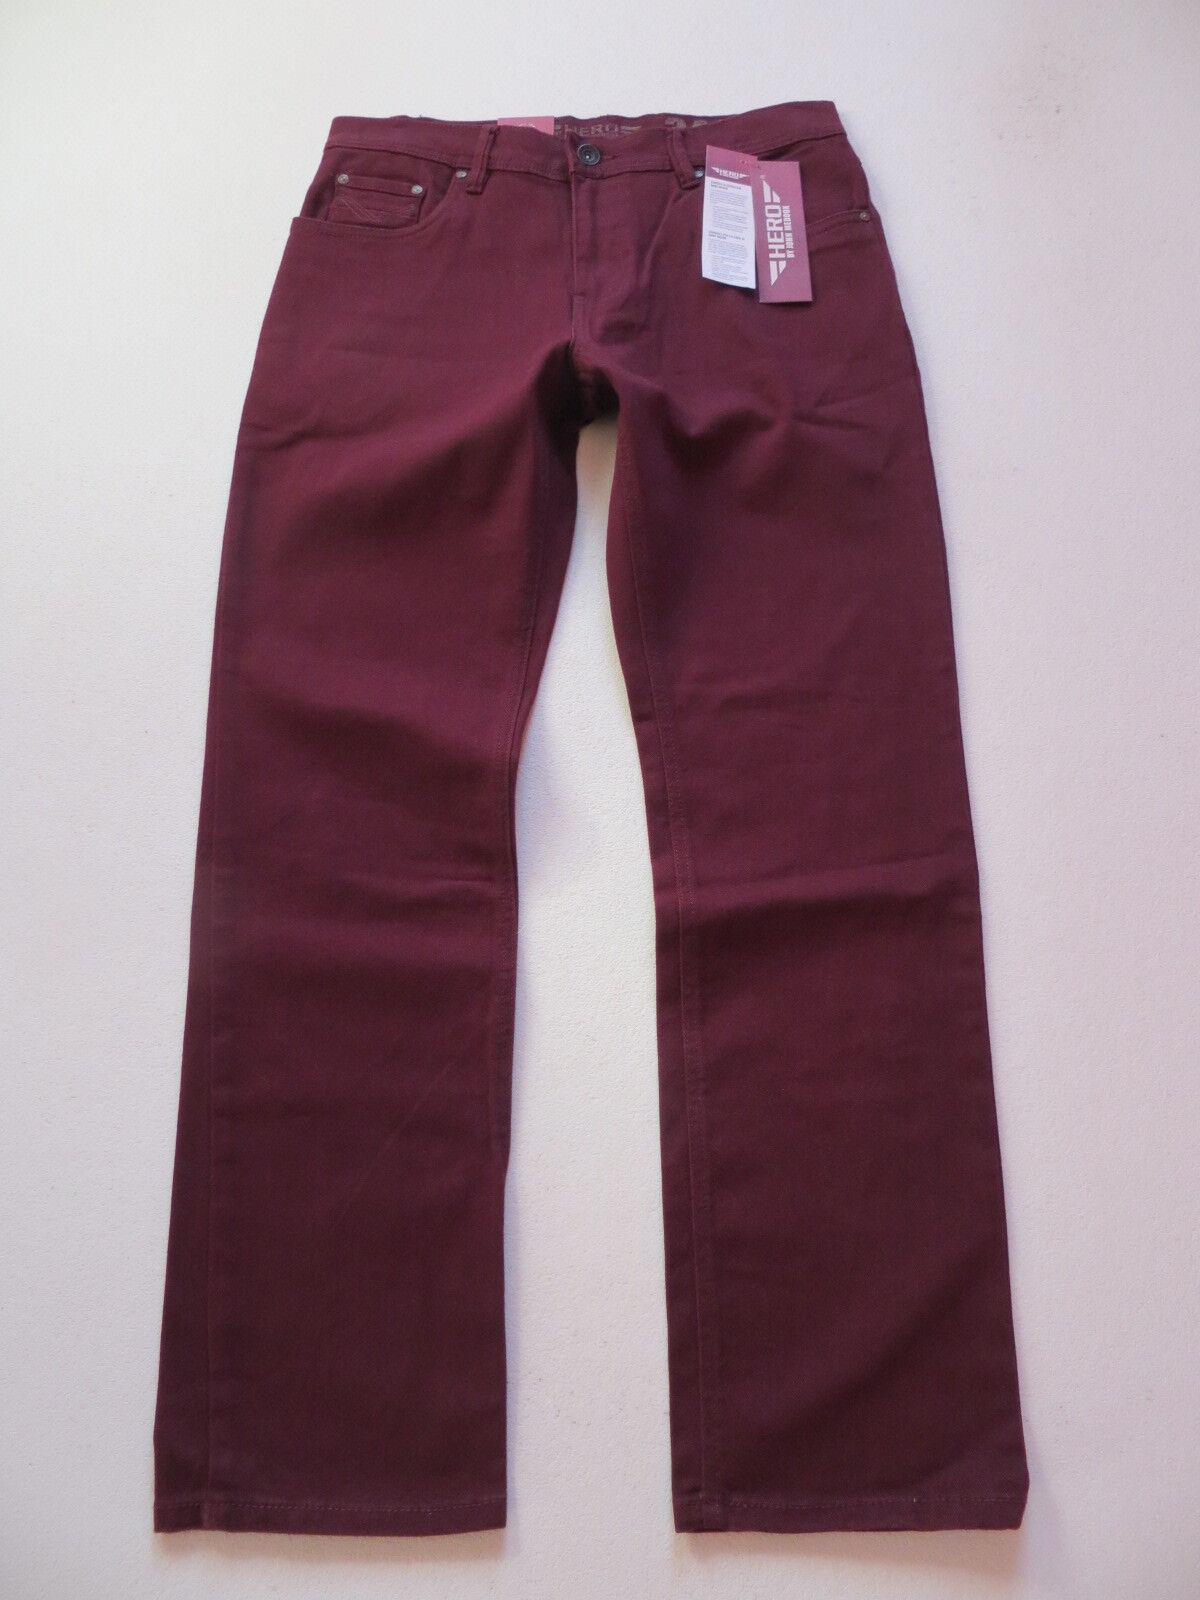 HERO John Medoox DENVER Stretch Jeans Hose W 34  L 32, wine, Bordeaux-red, NEU